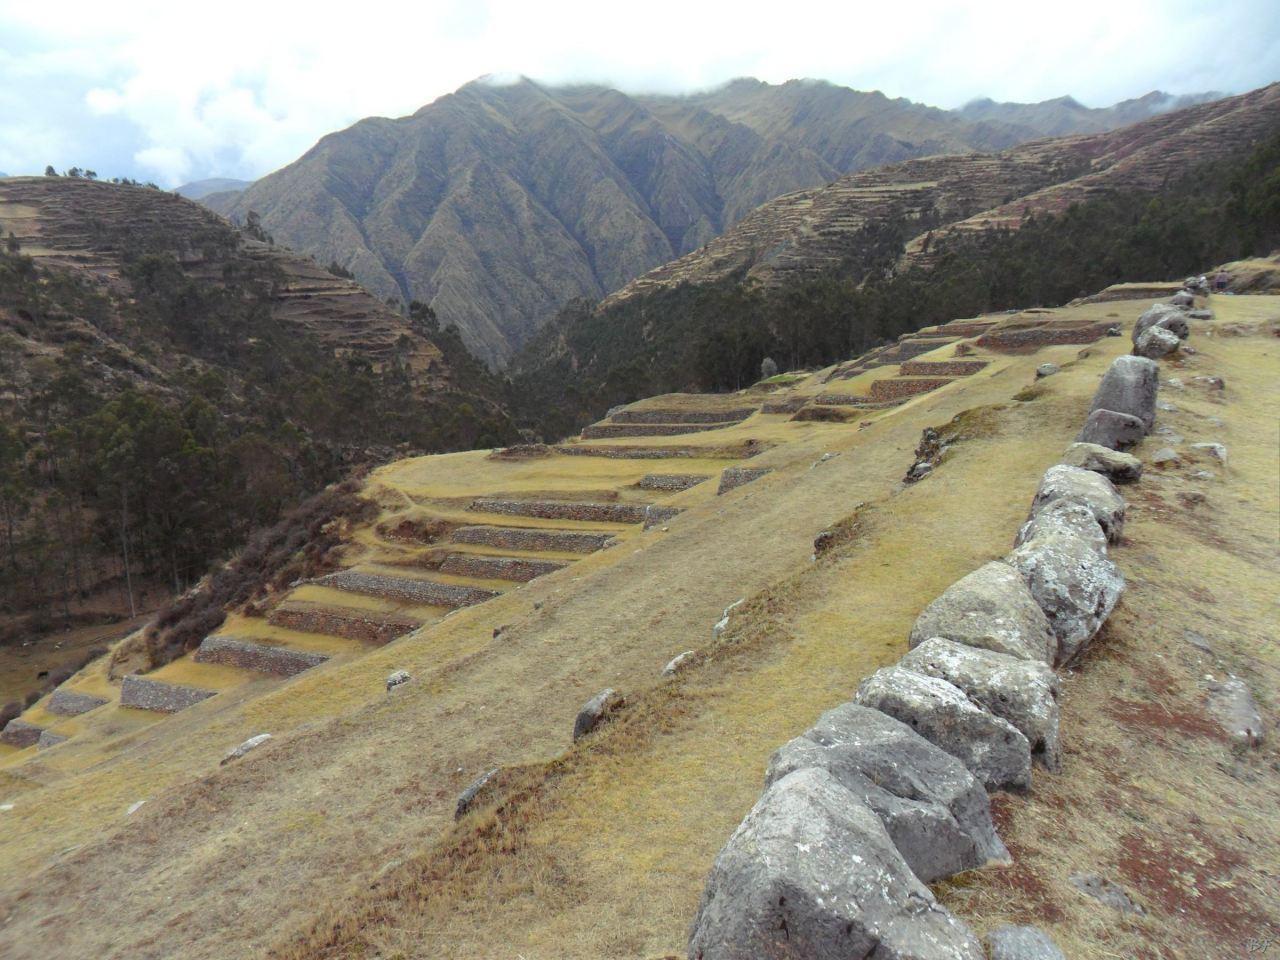 Chinchero-Mura-Poligonali-Piramide-Urubamba-Peru-50